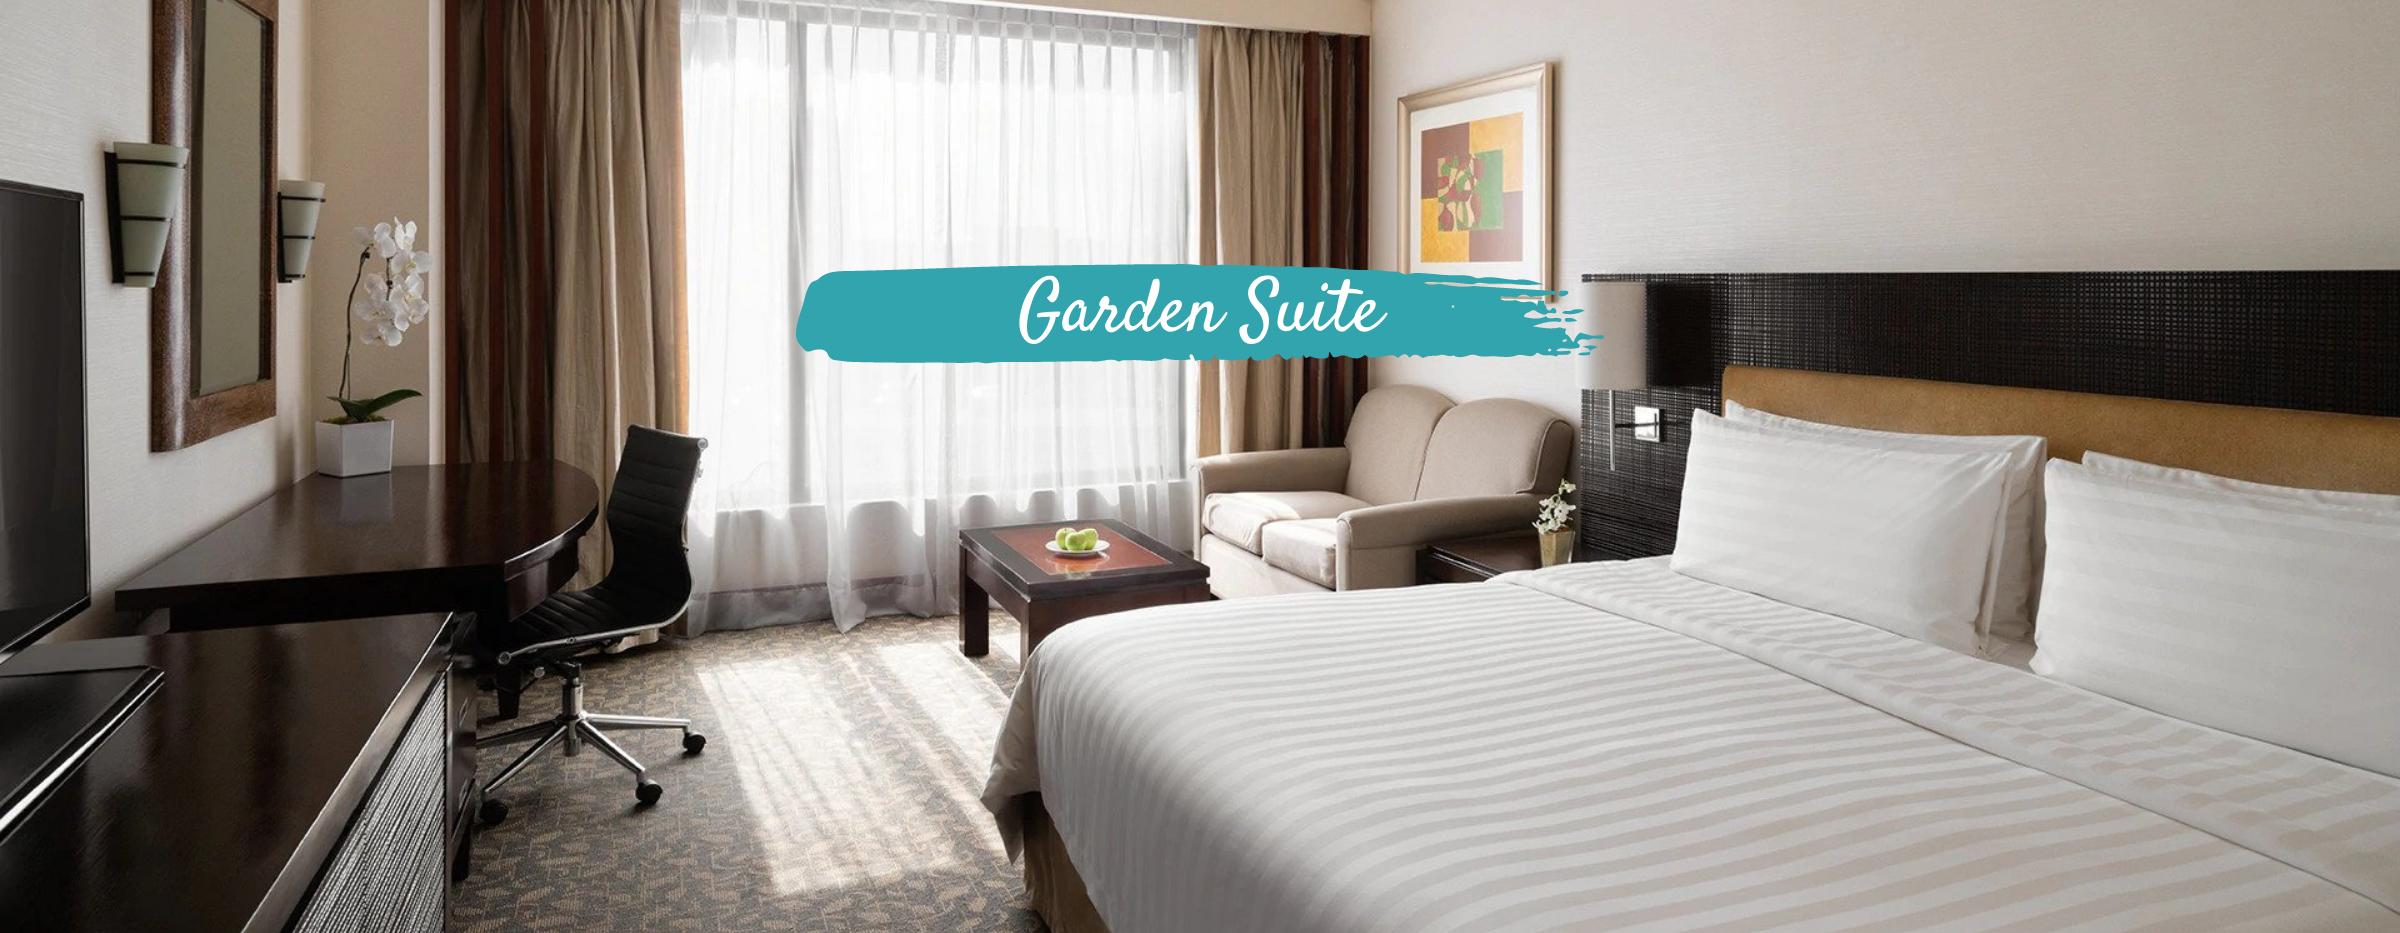 Edsa Shangri-La Garden Deluxe Room| JFK to MNL Philippine Airlines Quarantine Package